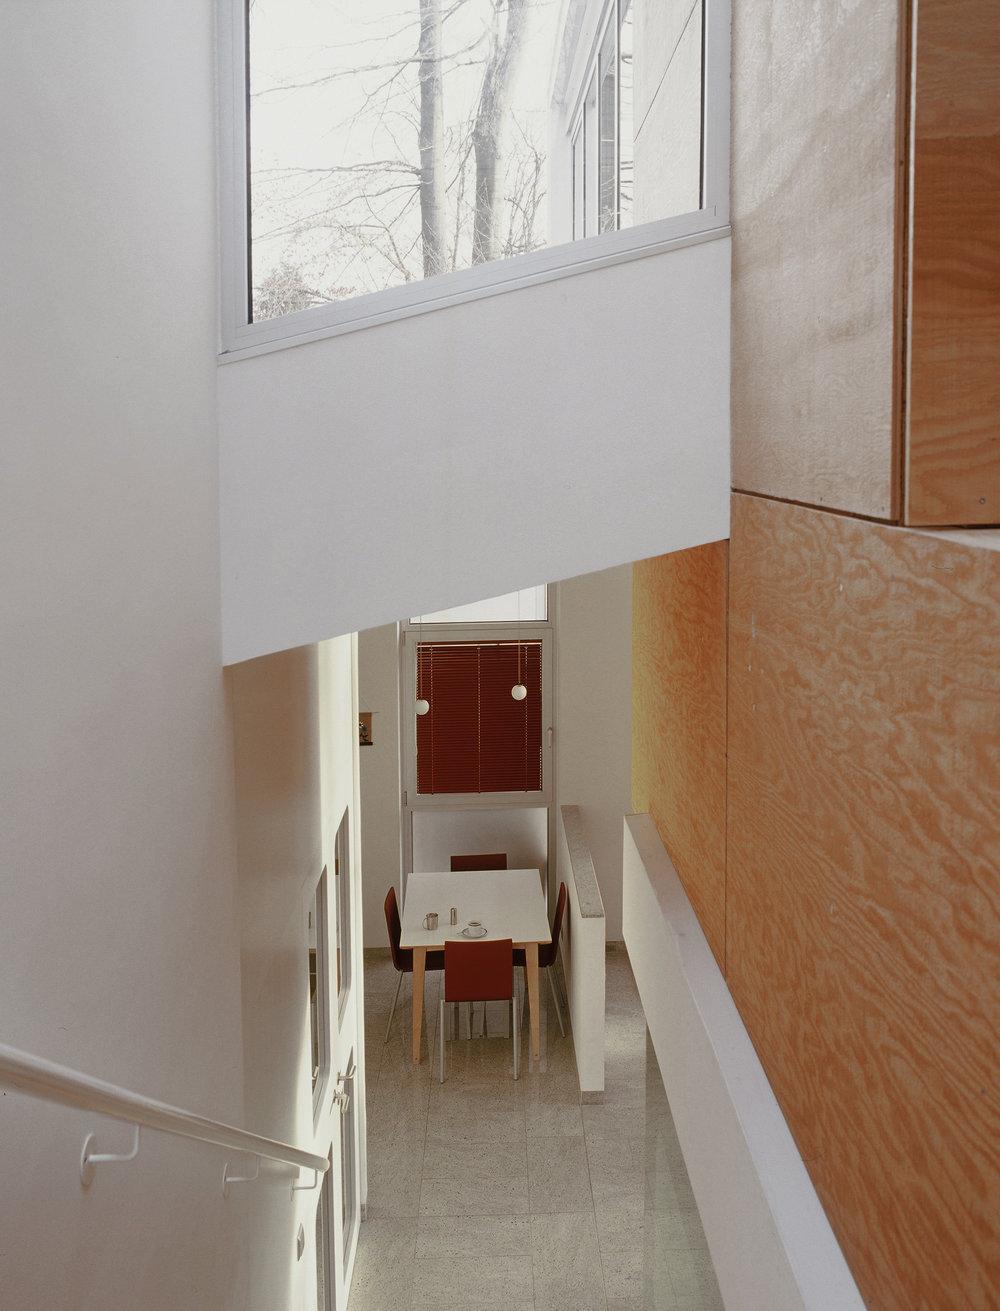 A01 architects - Residence Eiser_(c) Nadine Blanchard__web07.jpg